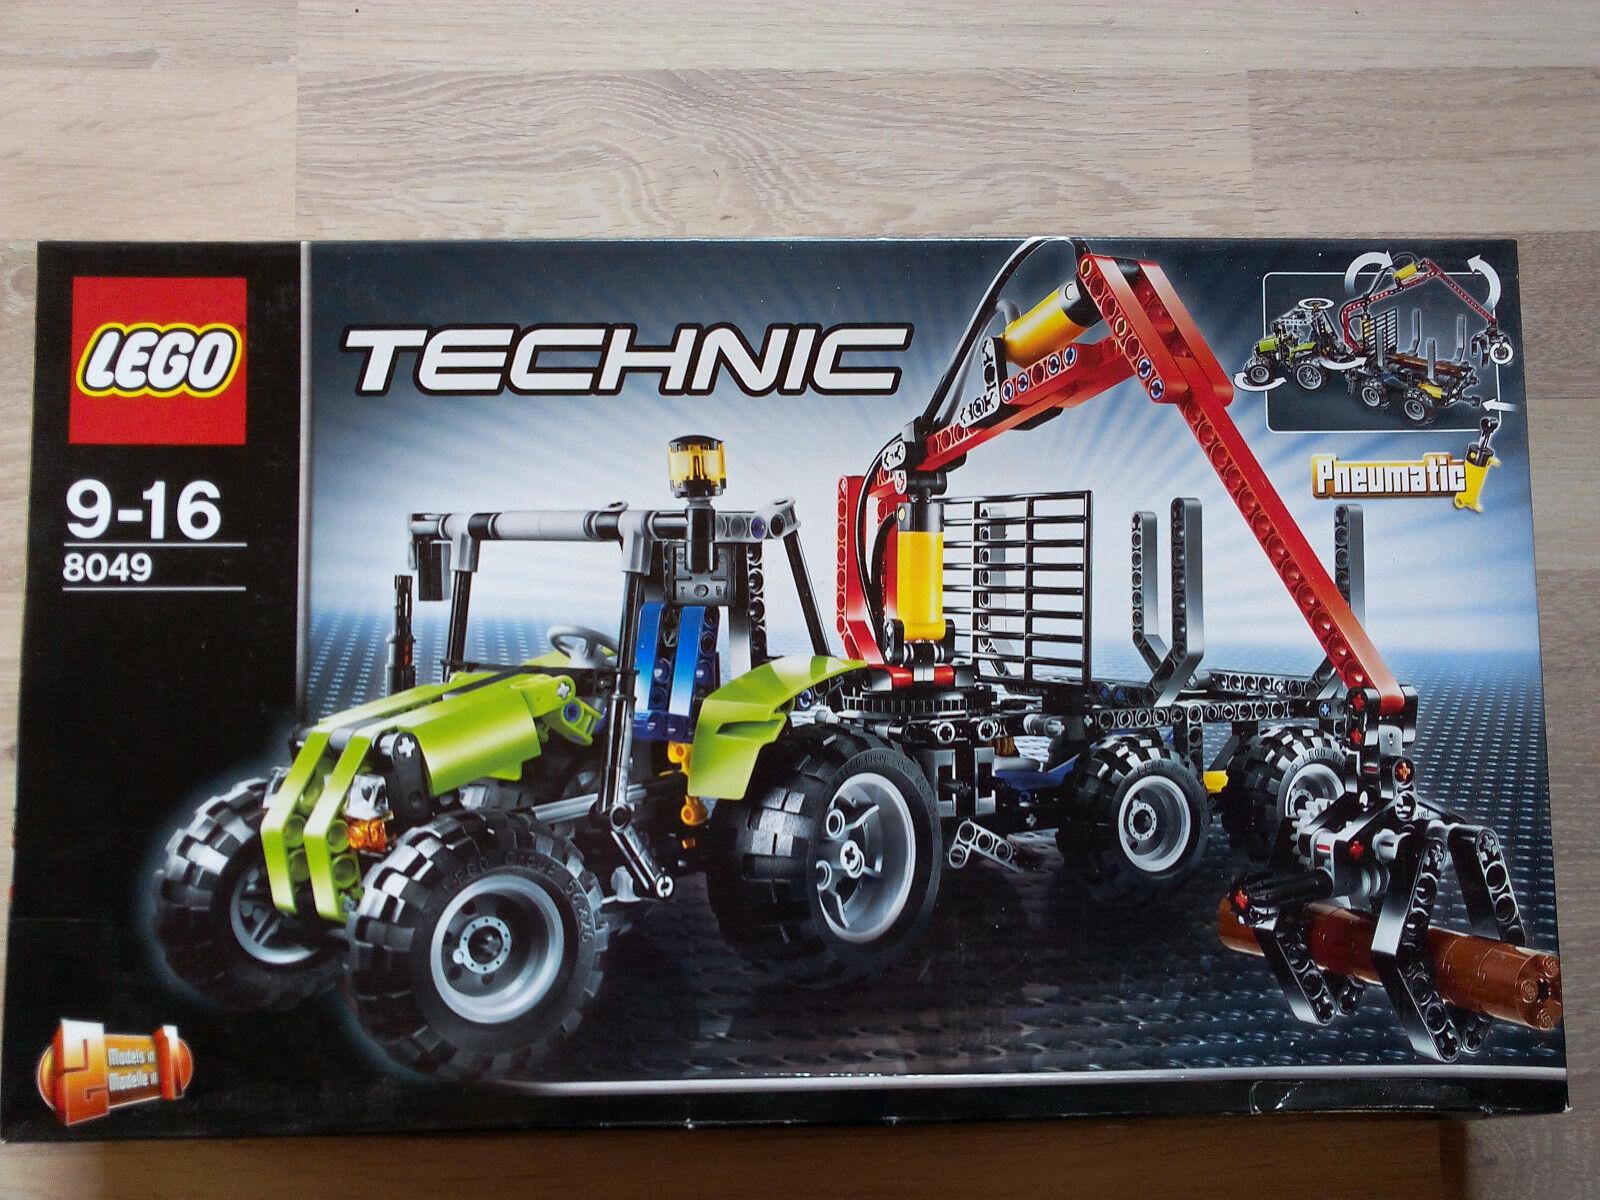 Lego Technic Technik 8049 Tractor with Log Loader / NEU NEU NEU & OVP - UNGEÖFFNET 31e595